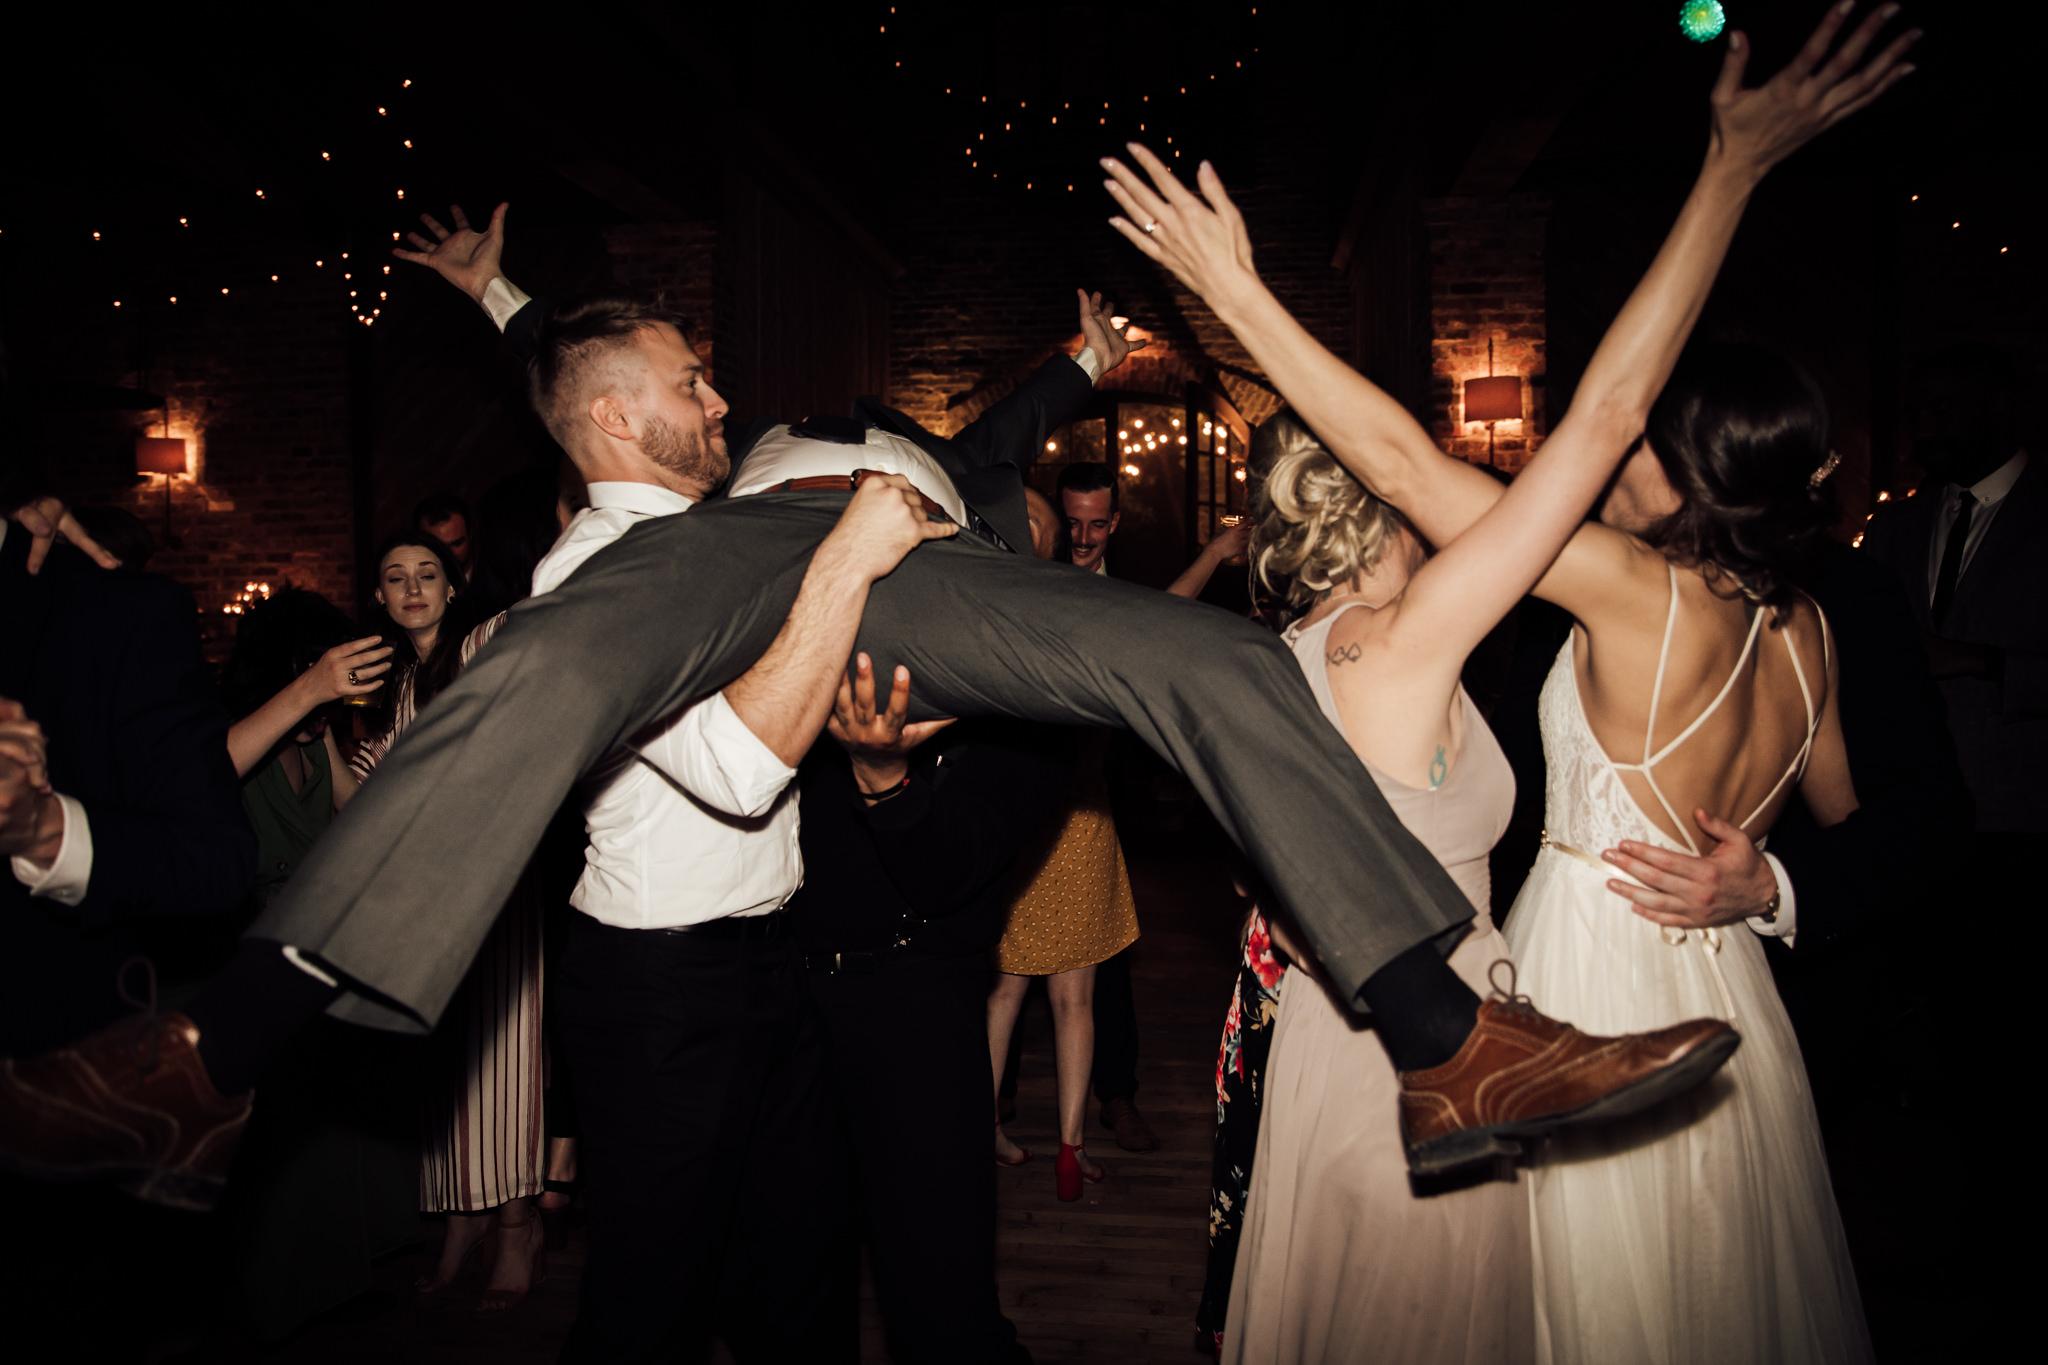 phantom-canyon-brewery-colorado-springs-wedding-photographer-481.jpg